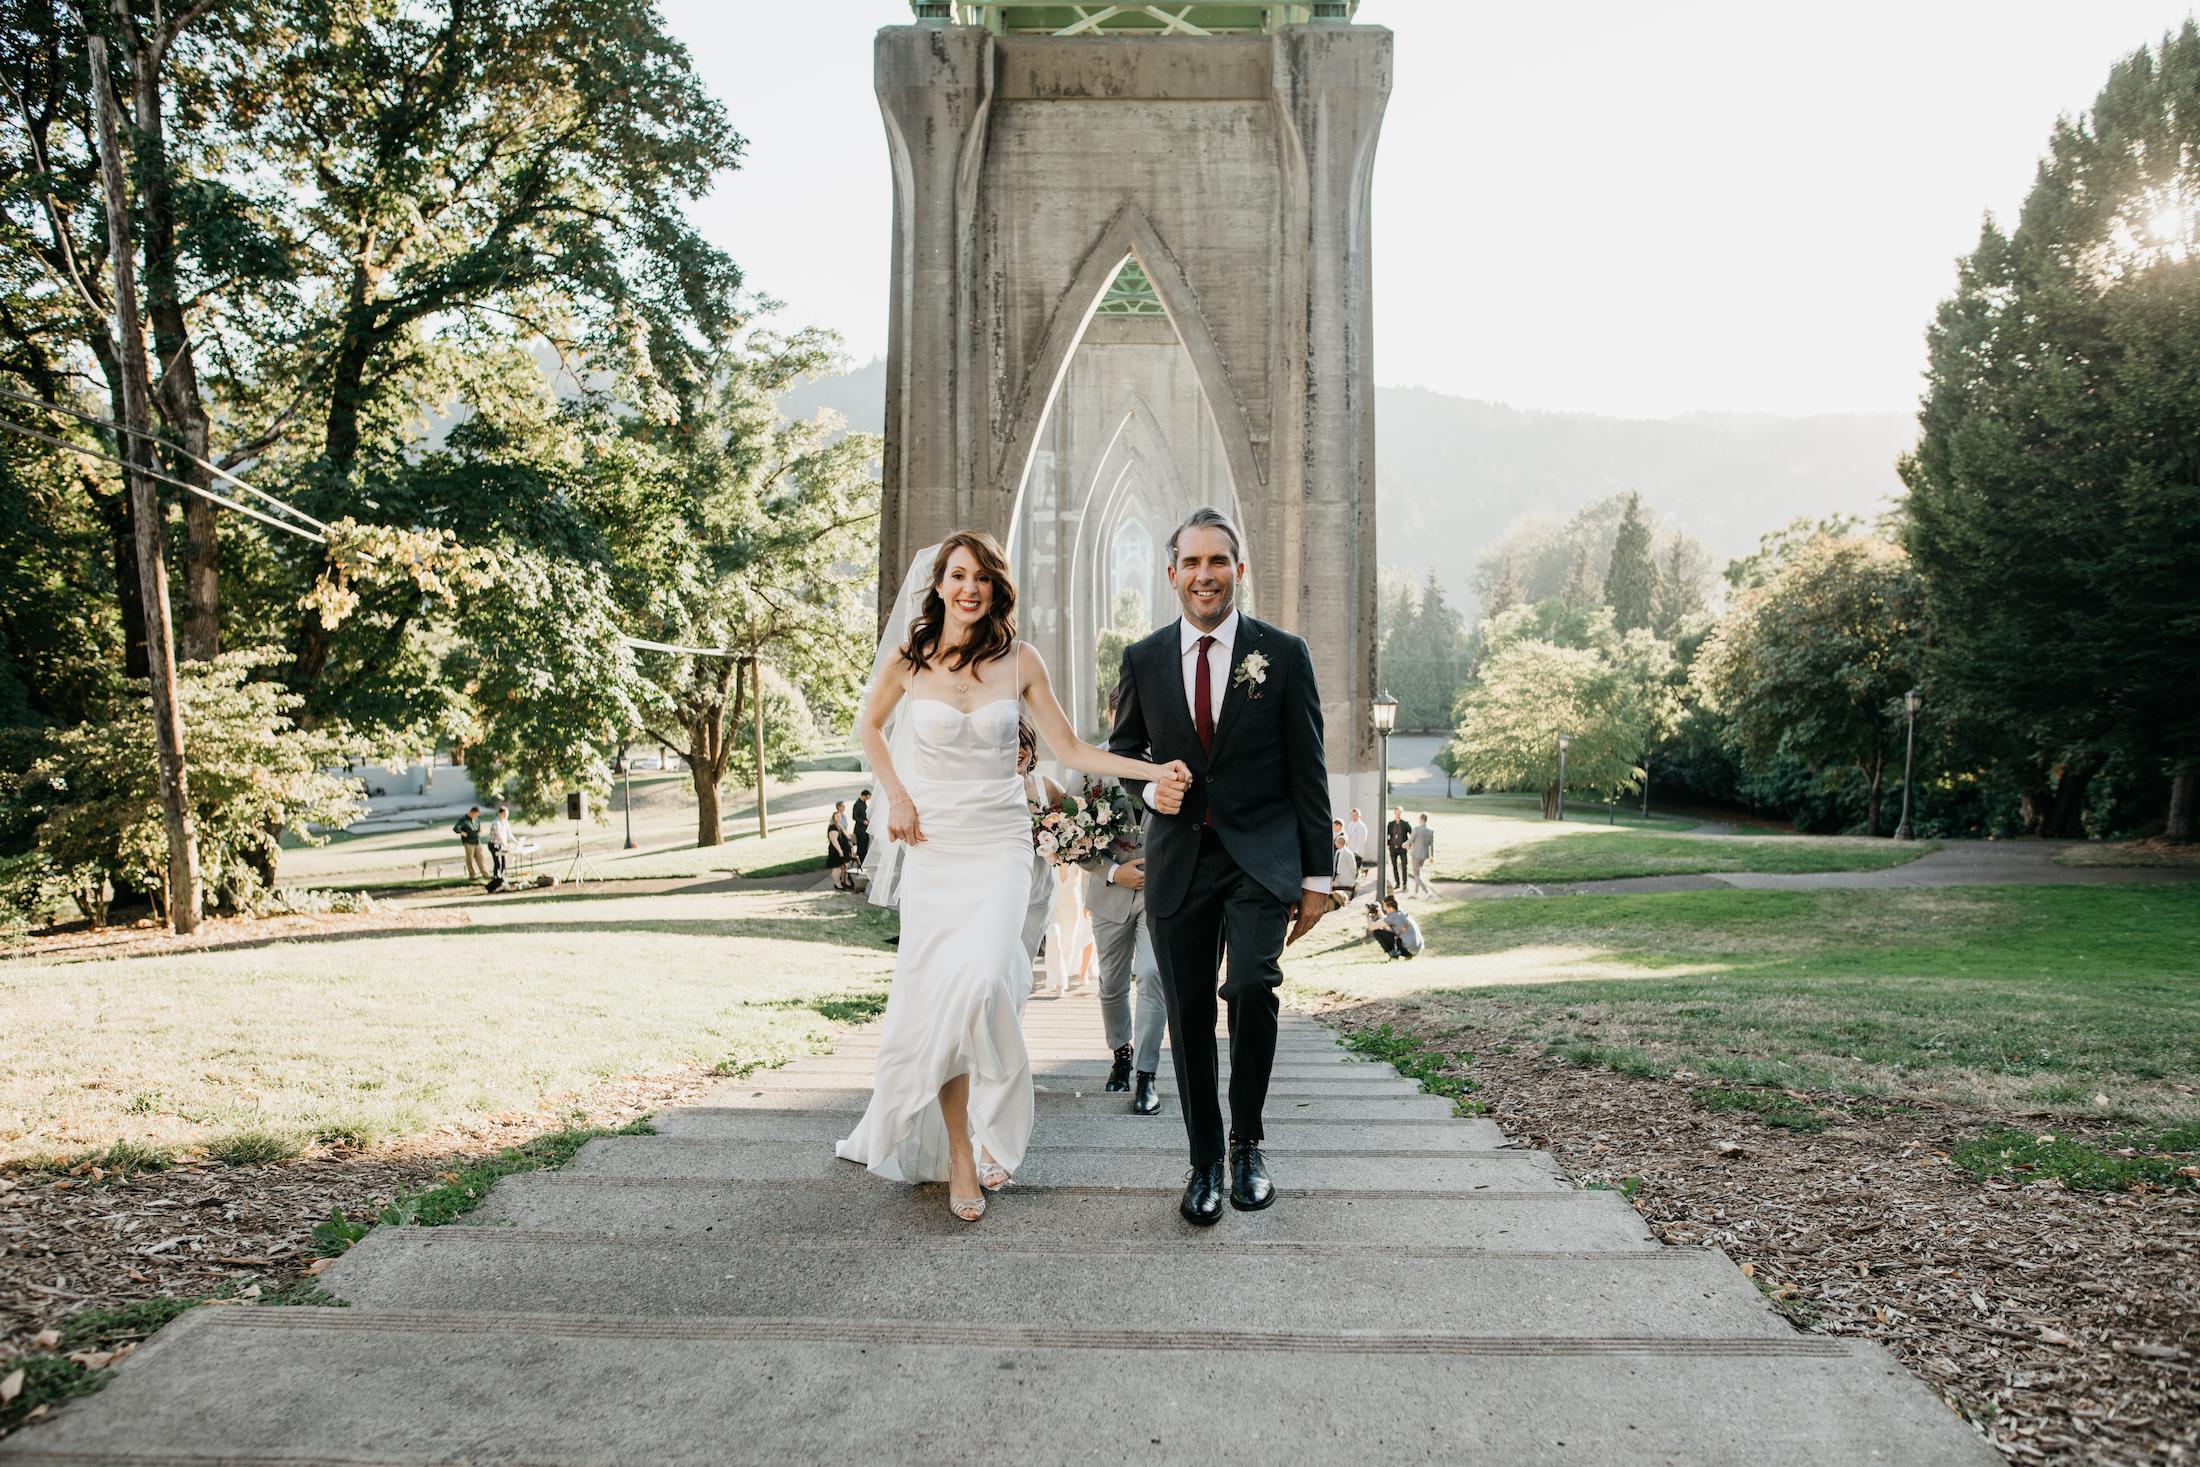 cathedral-park-portland-wedding-photographer-baker-building-wedding487.jpg